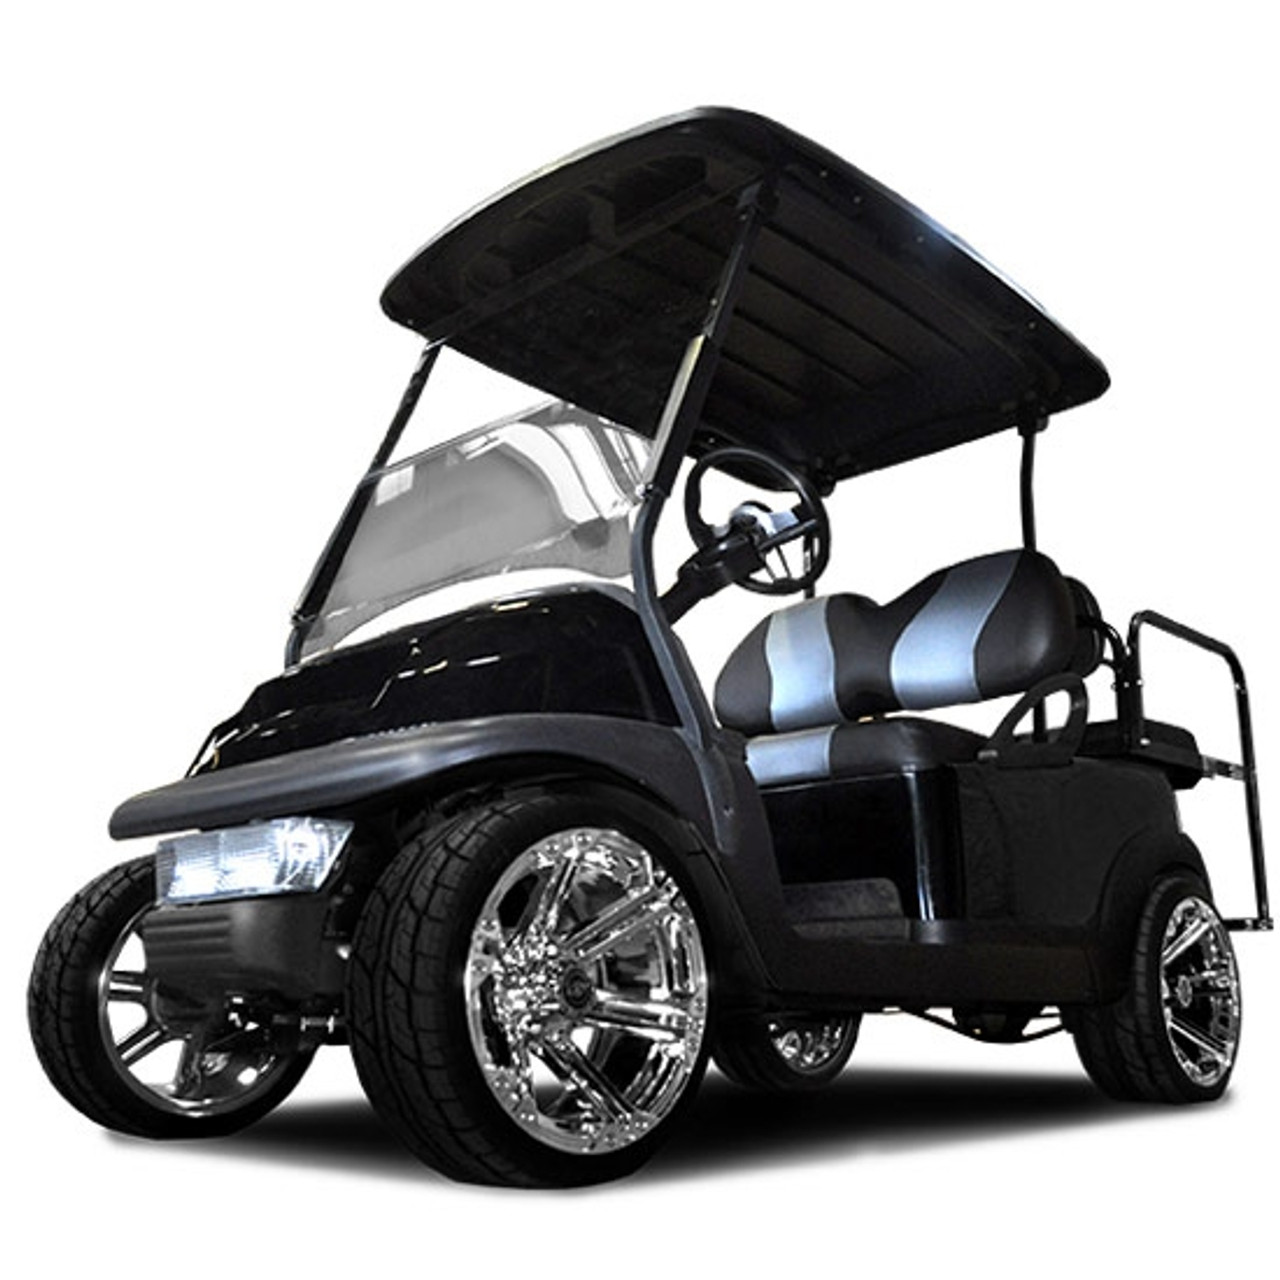 Golf Cart Lift Kits Best Quality Ezgo Club Car Amp More